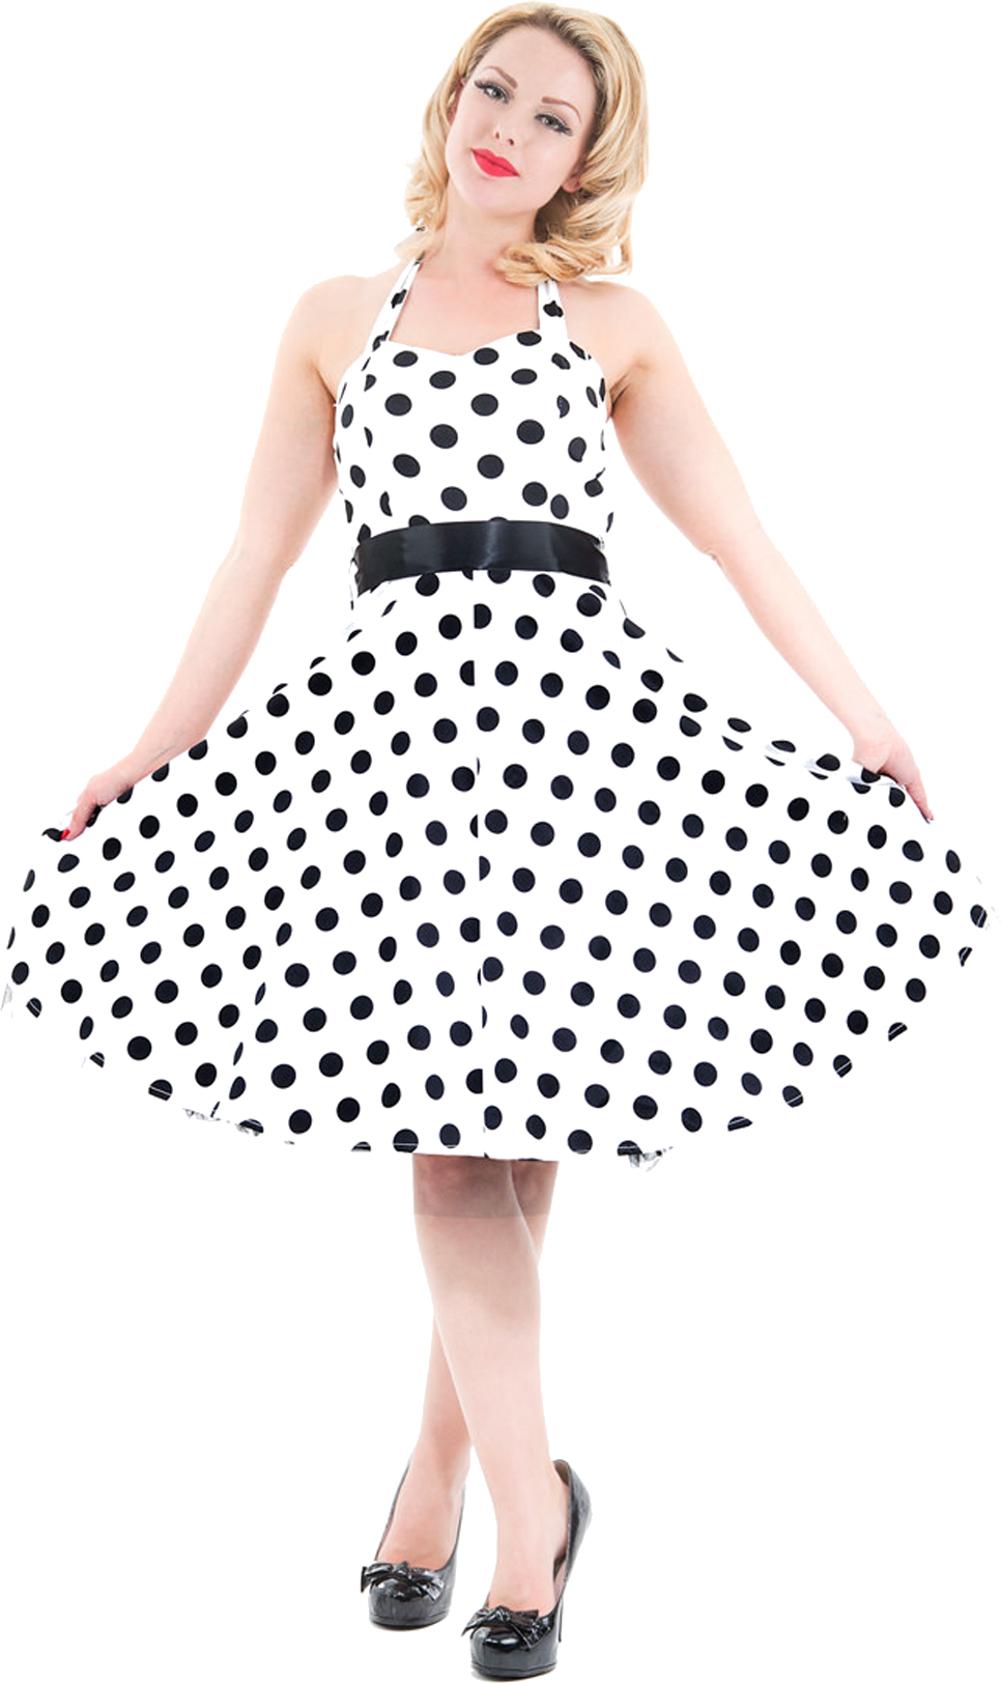 h&r retro punkte polka dots petticoat neckholder swing kleid dress w